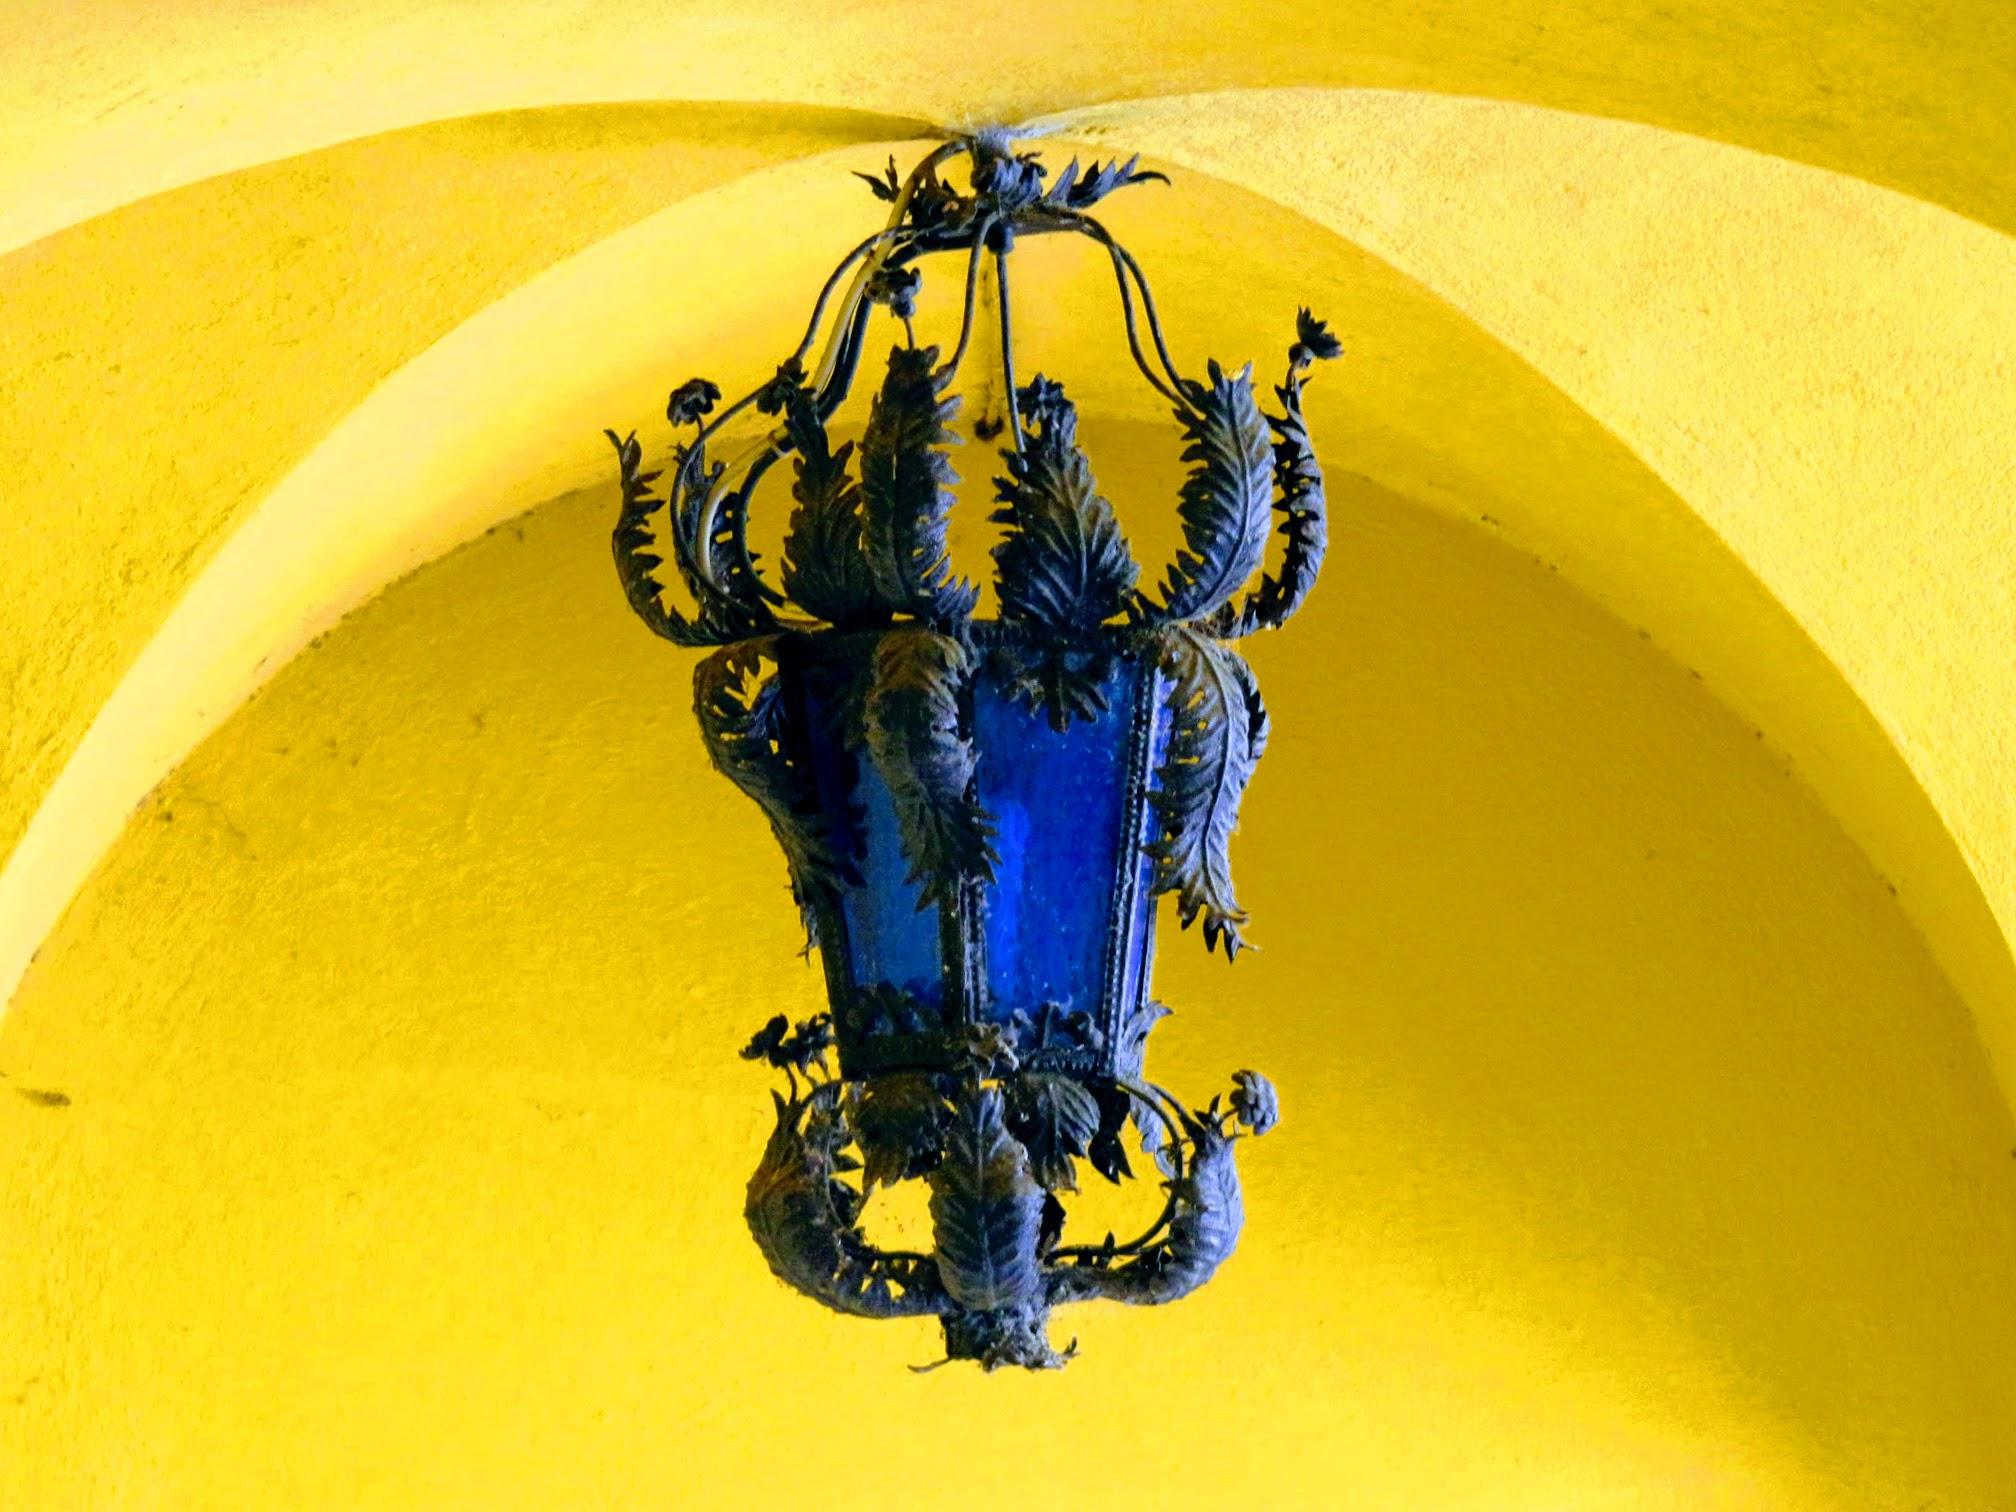 Blauwe lantaarn met gele achtergrond in het Il Vittoriale (Gardone Riviera)